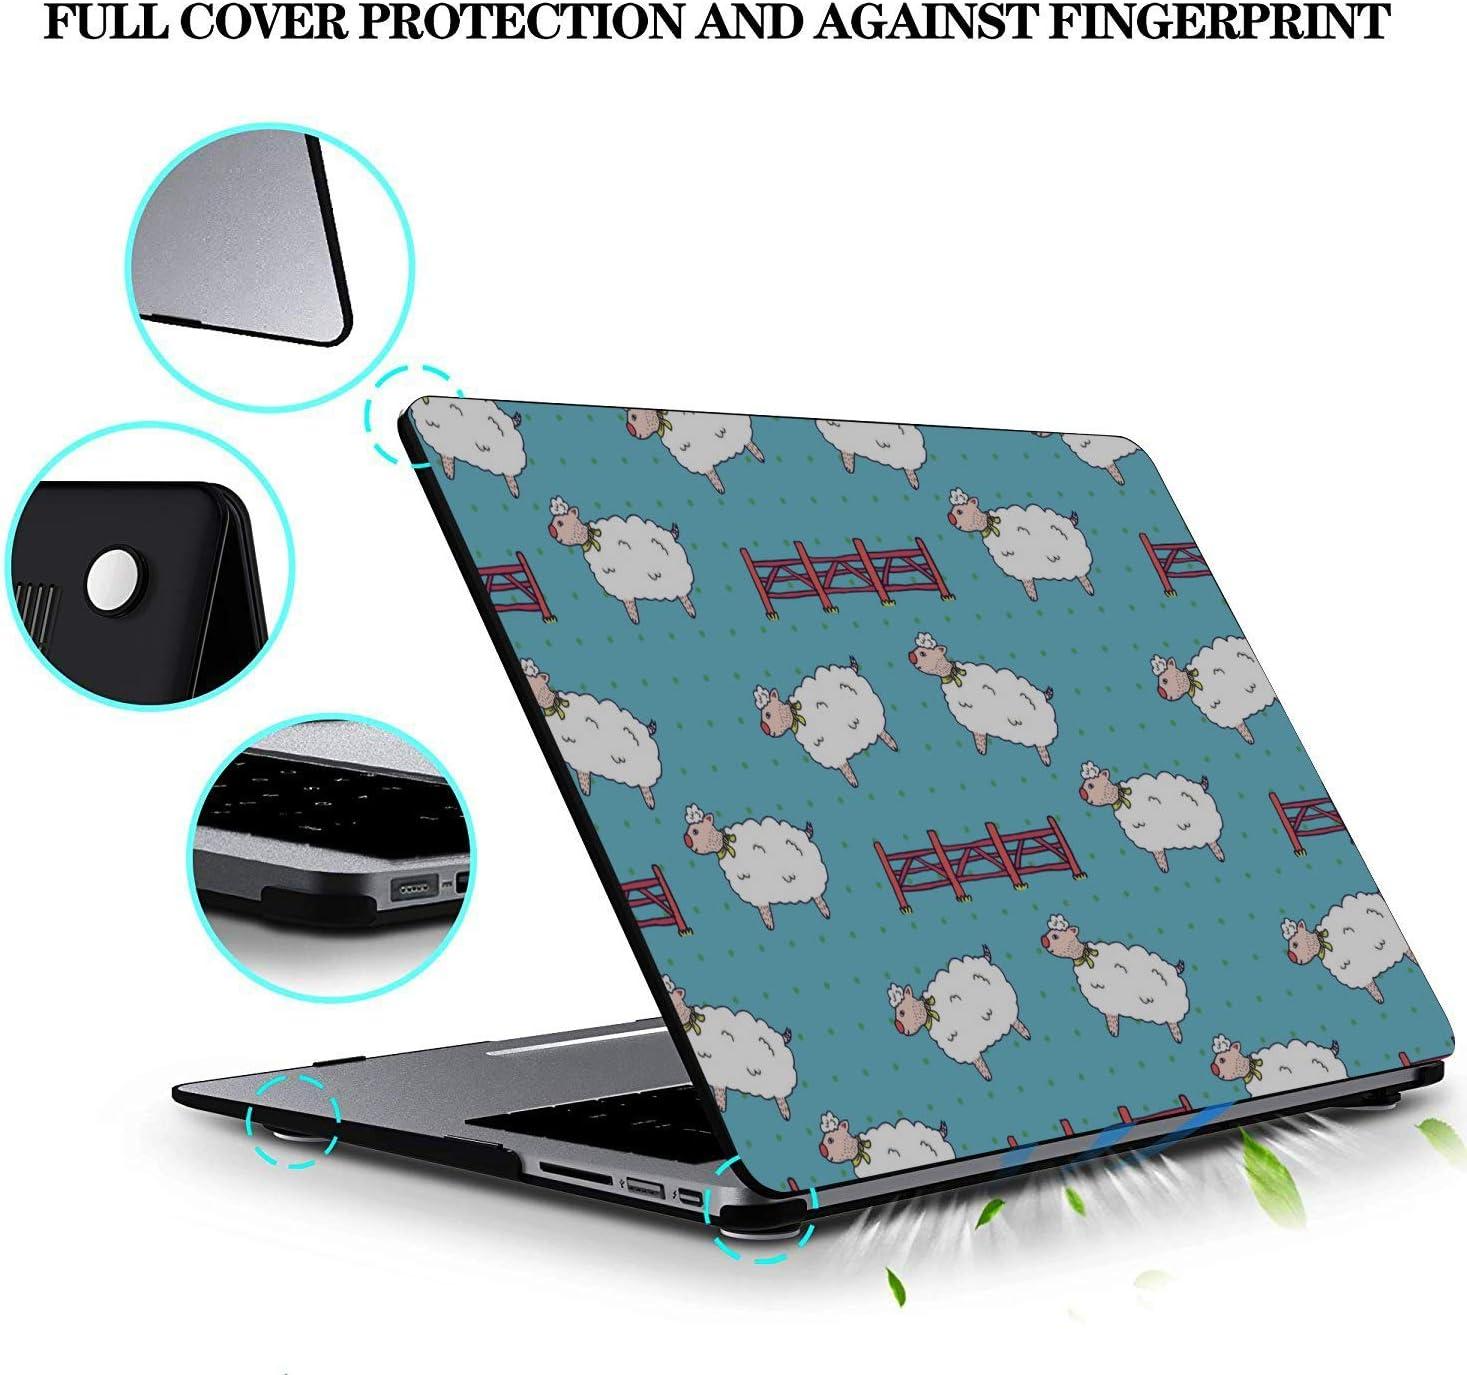 Case MacBook Pro 13 Sheep Retro Wild Animal Naturel Plastic Hard Shell Compatible Mac Air 11 Pro 13 15 MacBook Pro Case Protection for MacBook 2016-2019 Version